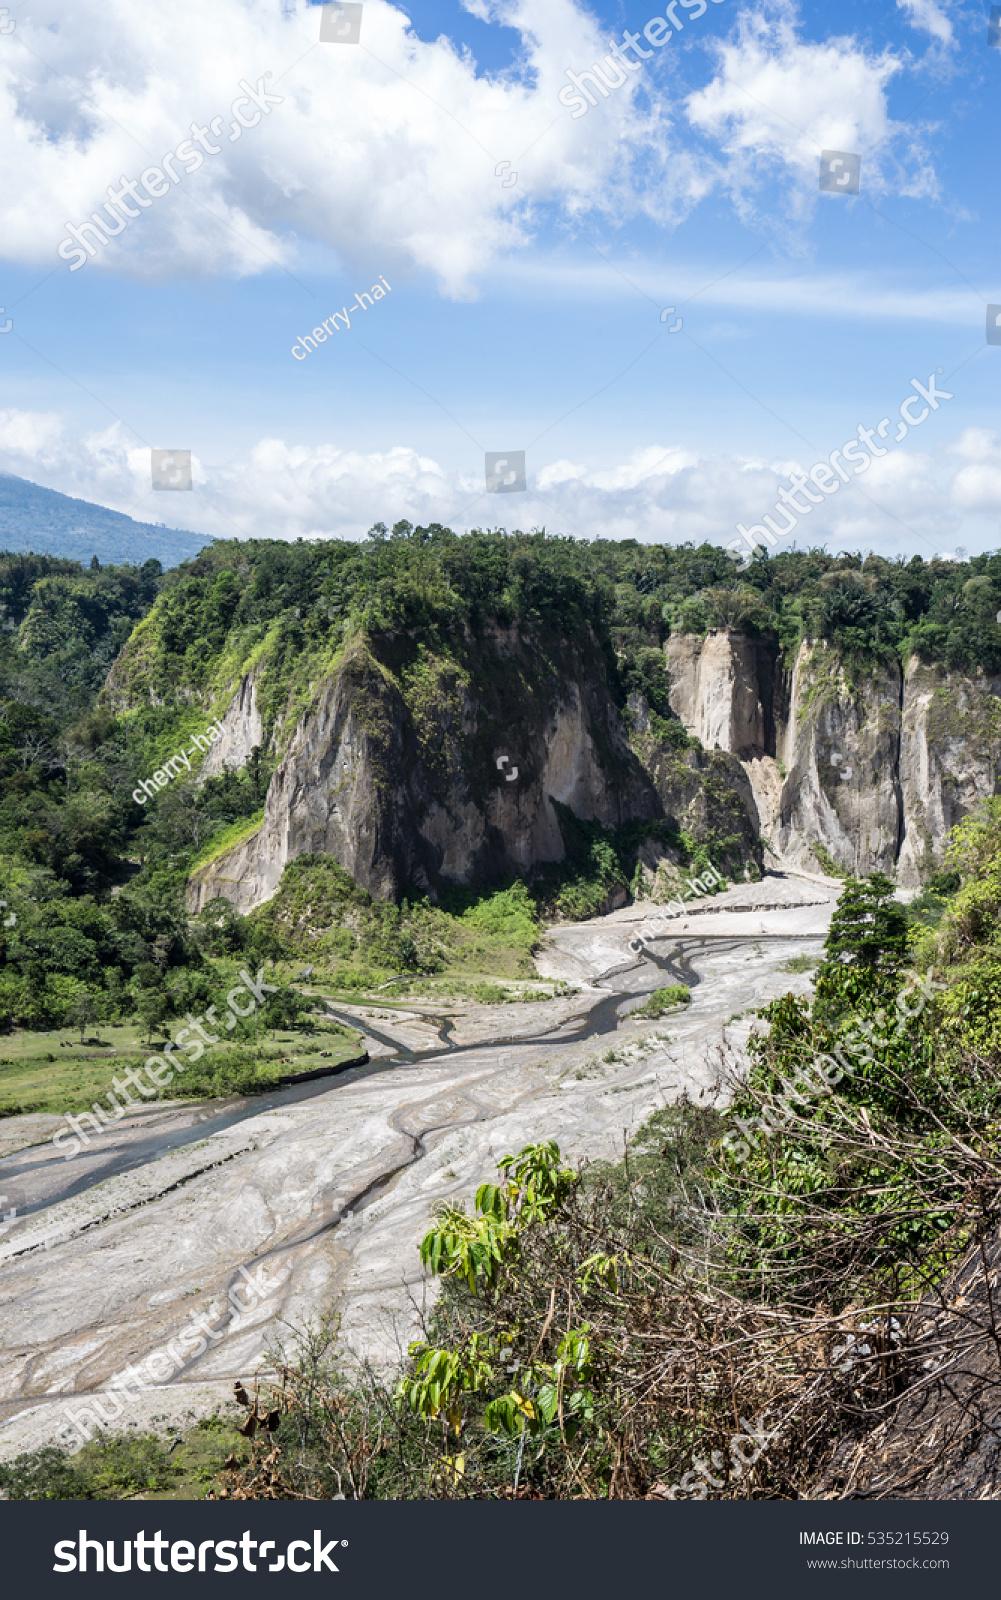 Indonesia. Sumatra. Rainfall in the canyon 31